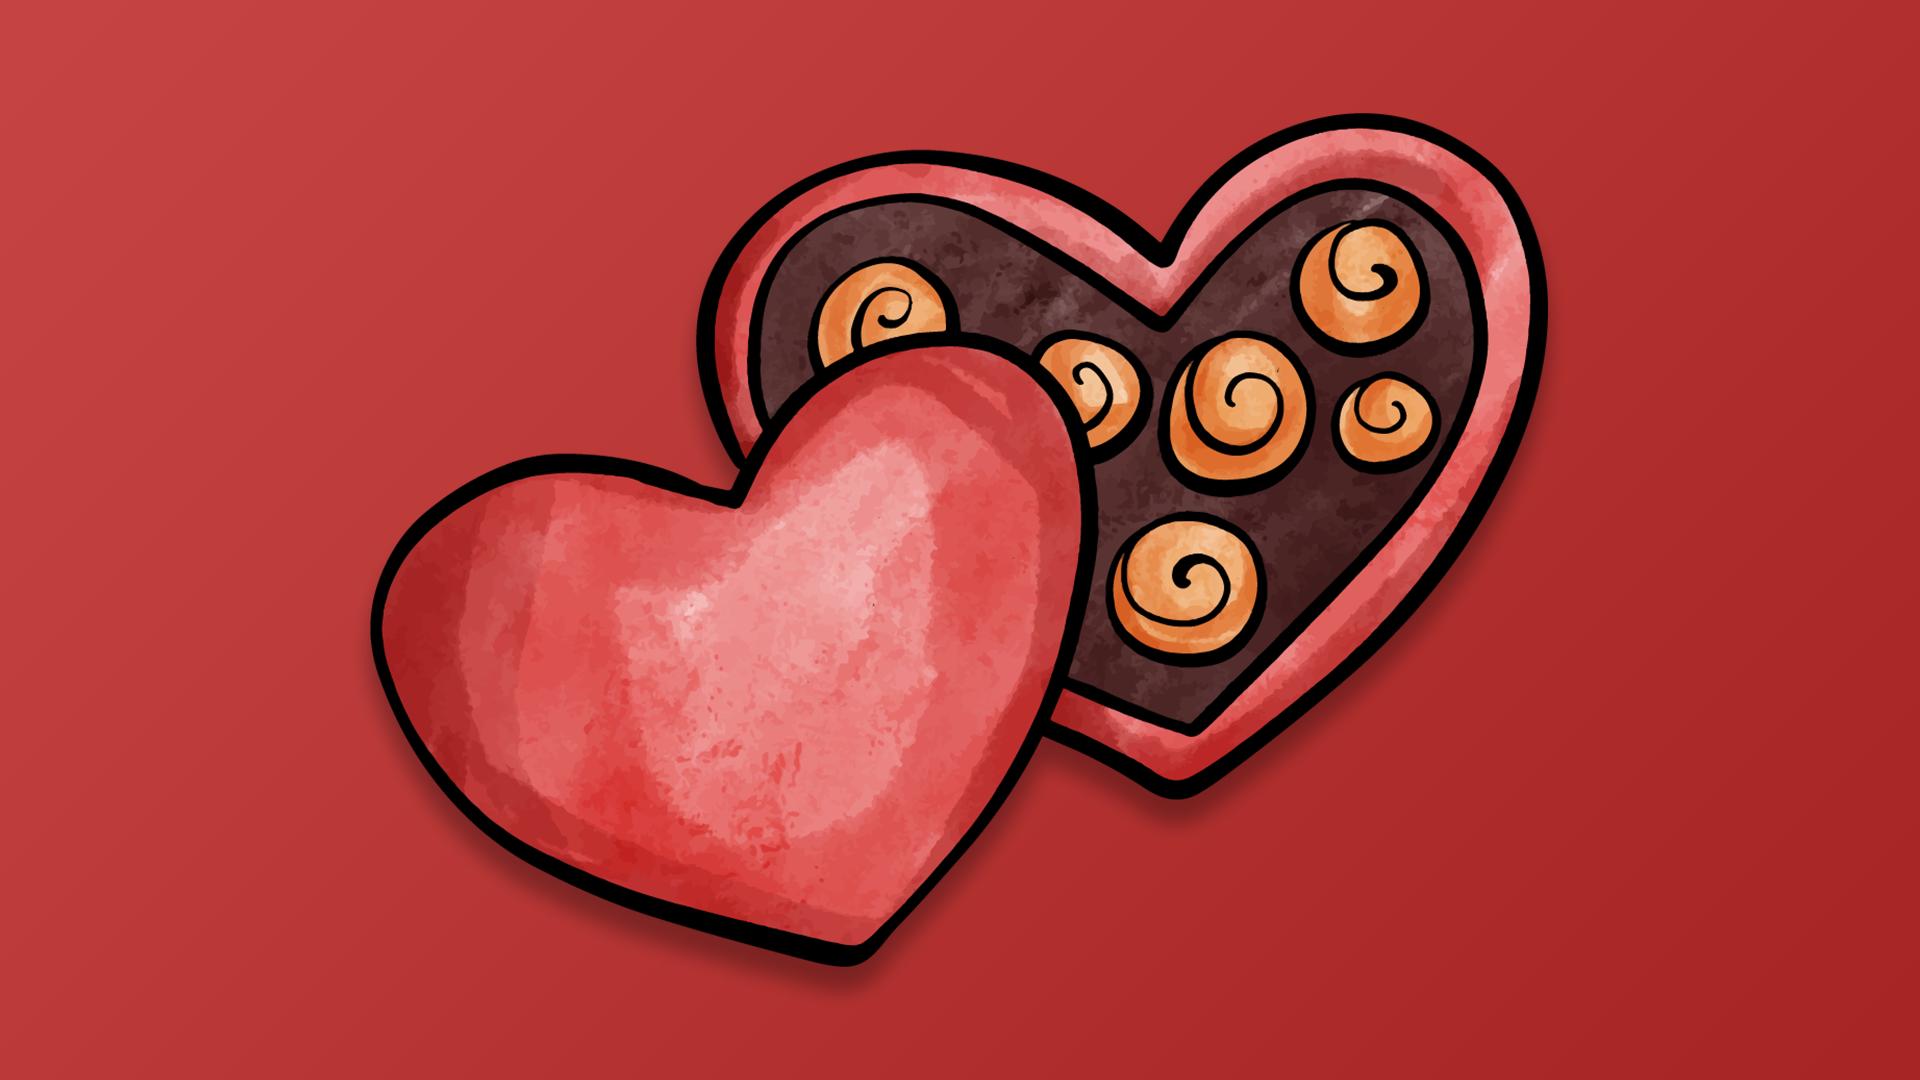 General 1920x1080 Valentine's Day digital heart red background Heart (Design) simple background